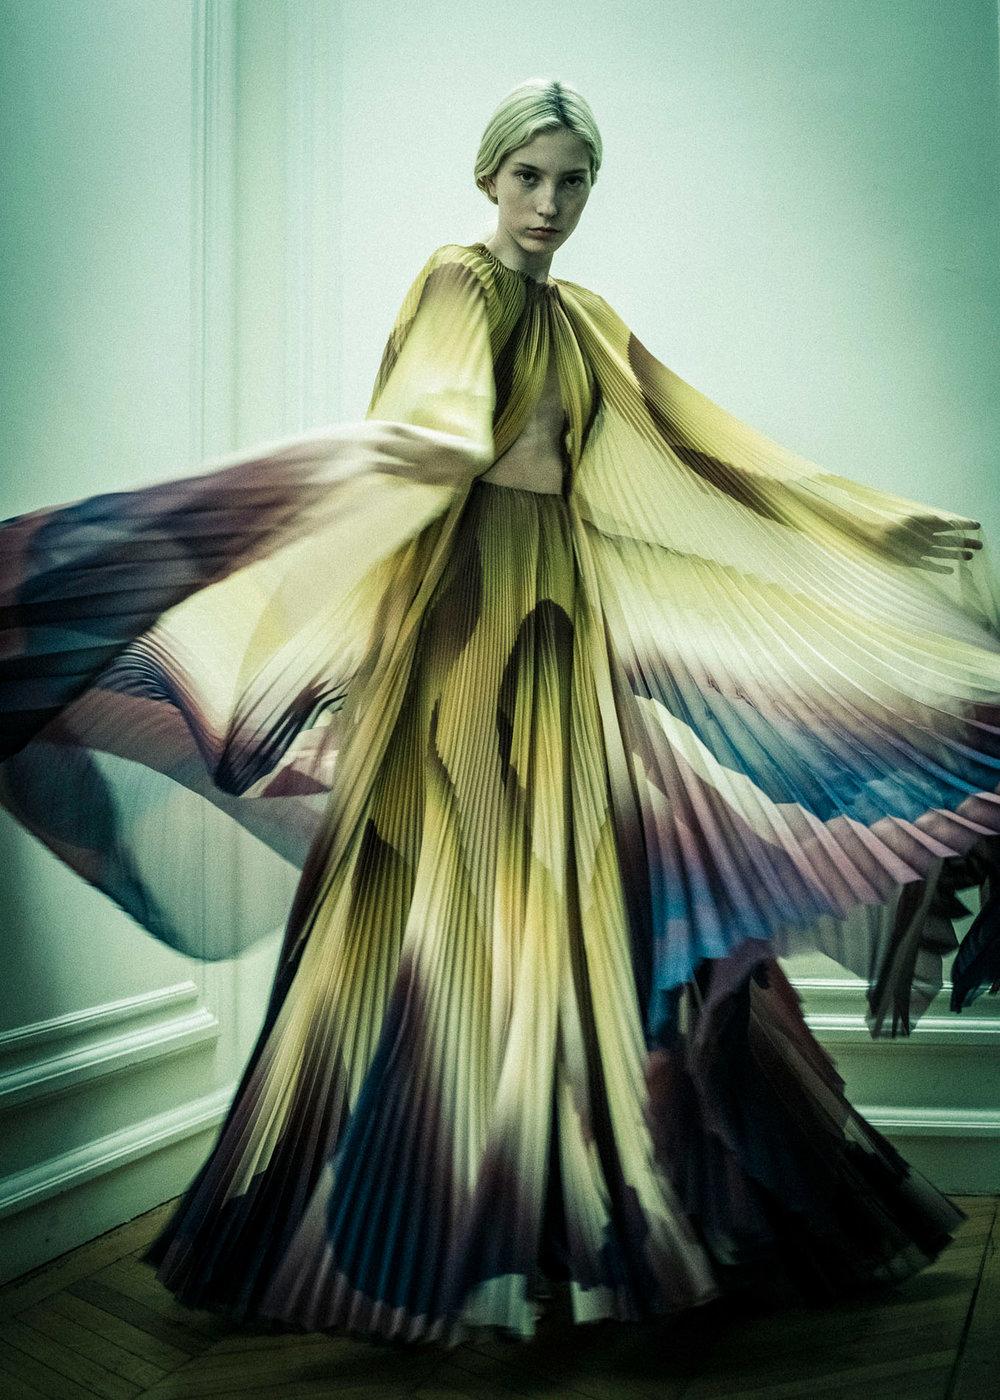 iris-van-herpen-couture-fashion-design_dezeen_2364_col_46.jpg